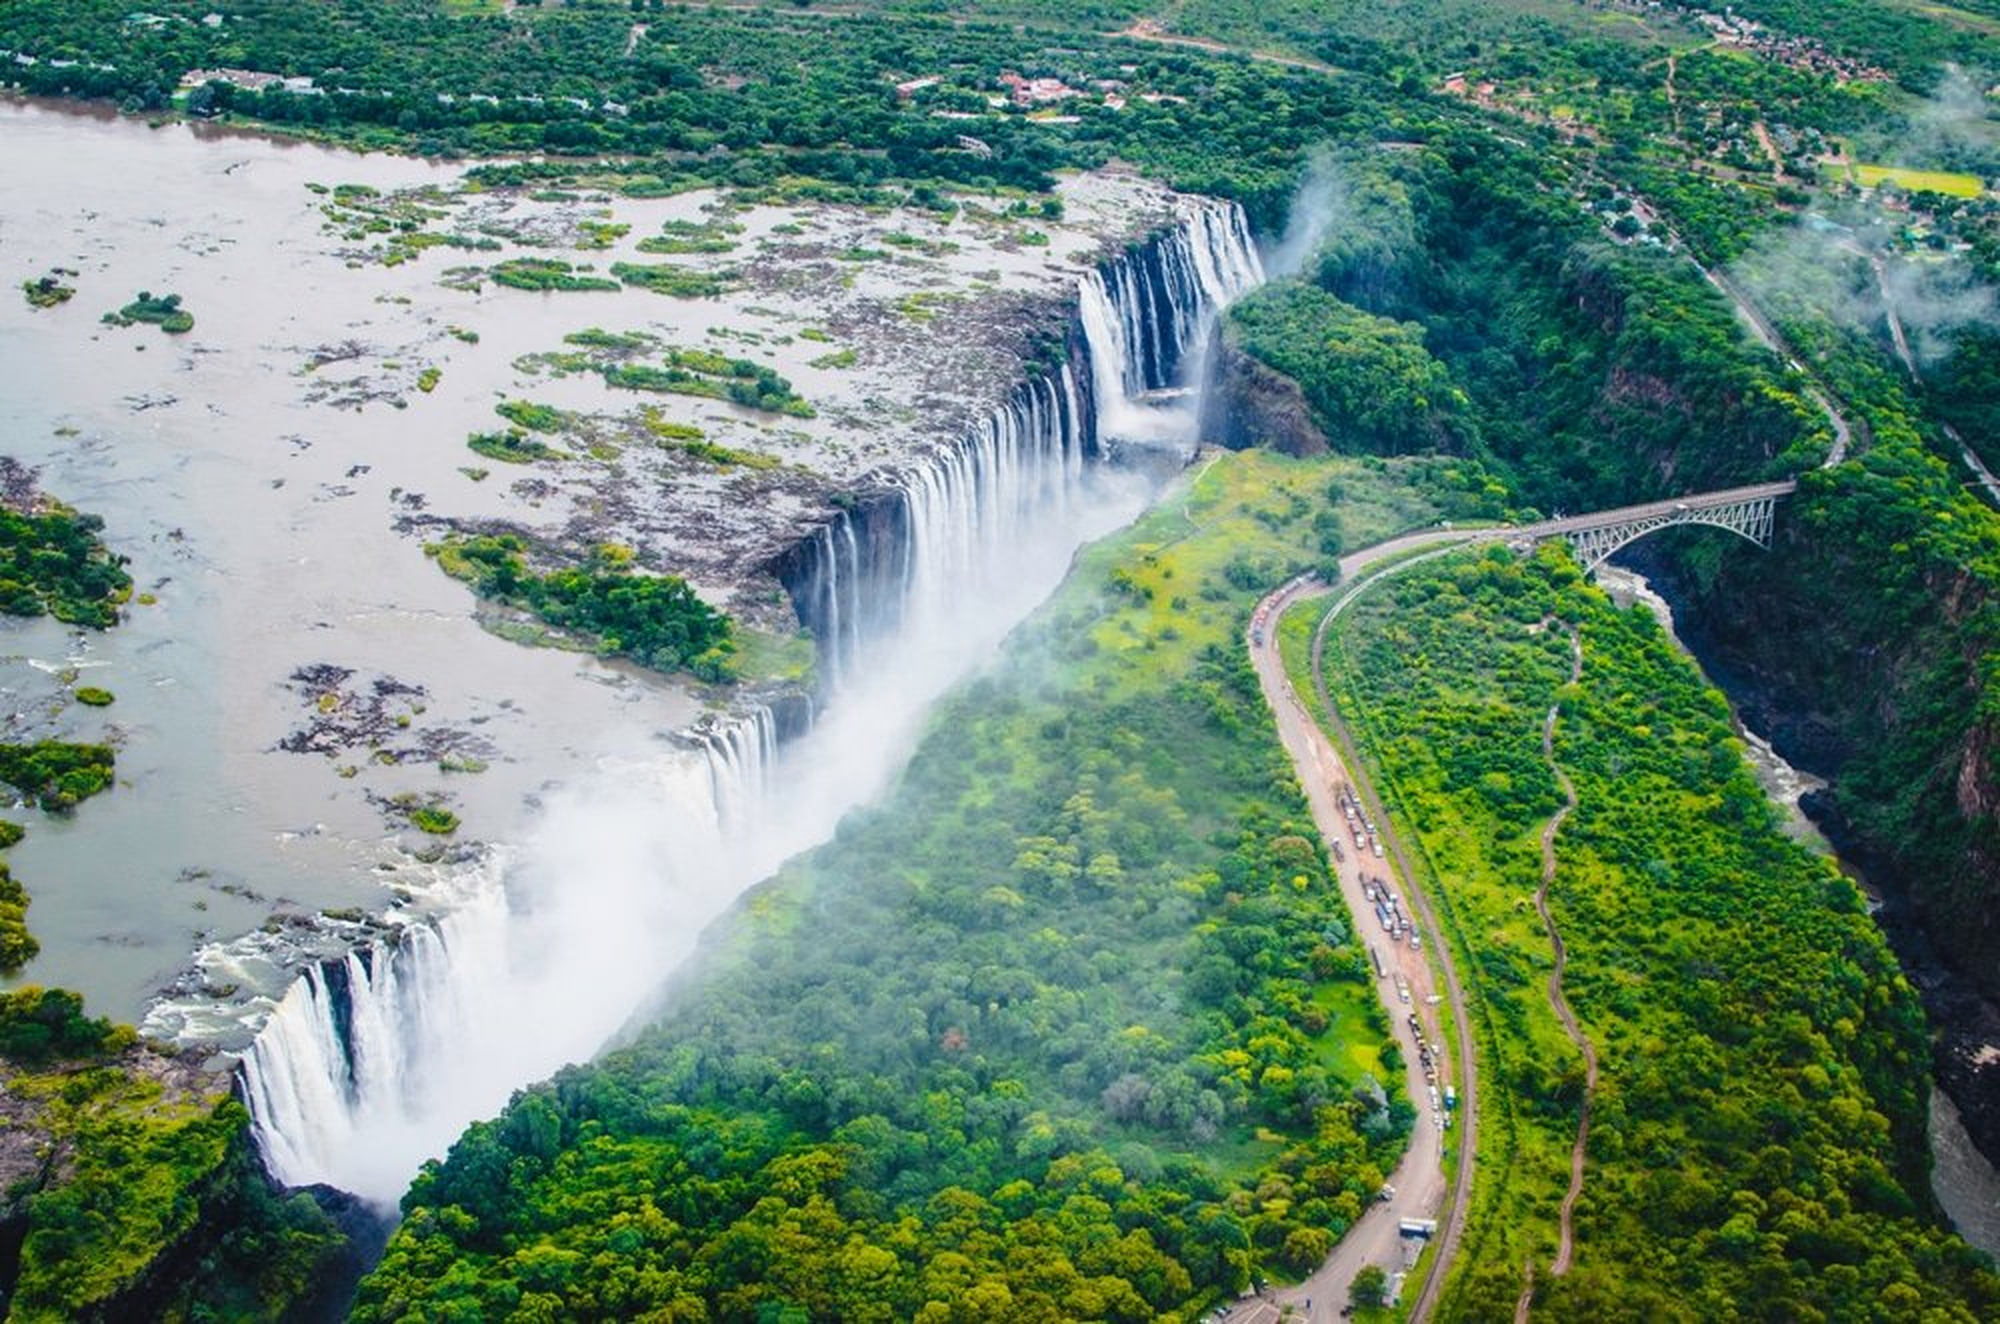 Visiter les Chutes de Victoria en Zambie